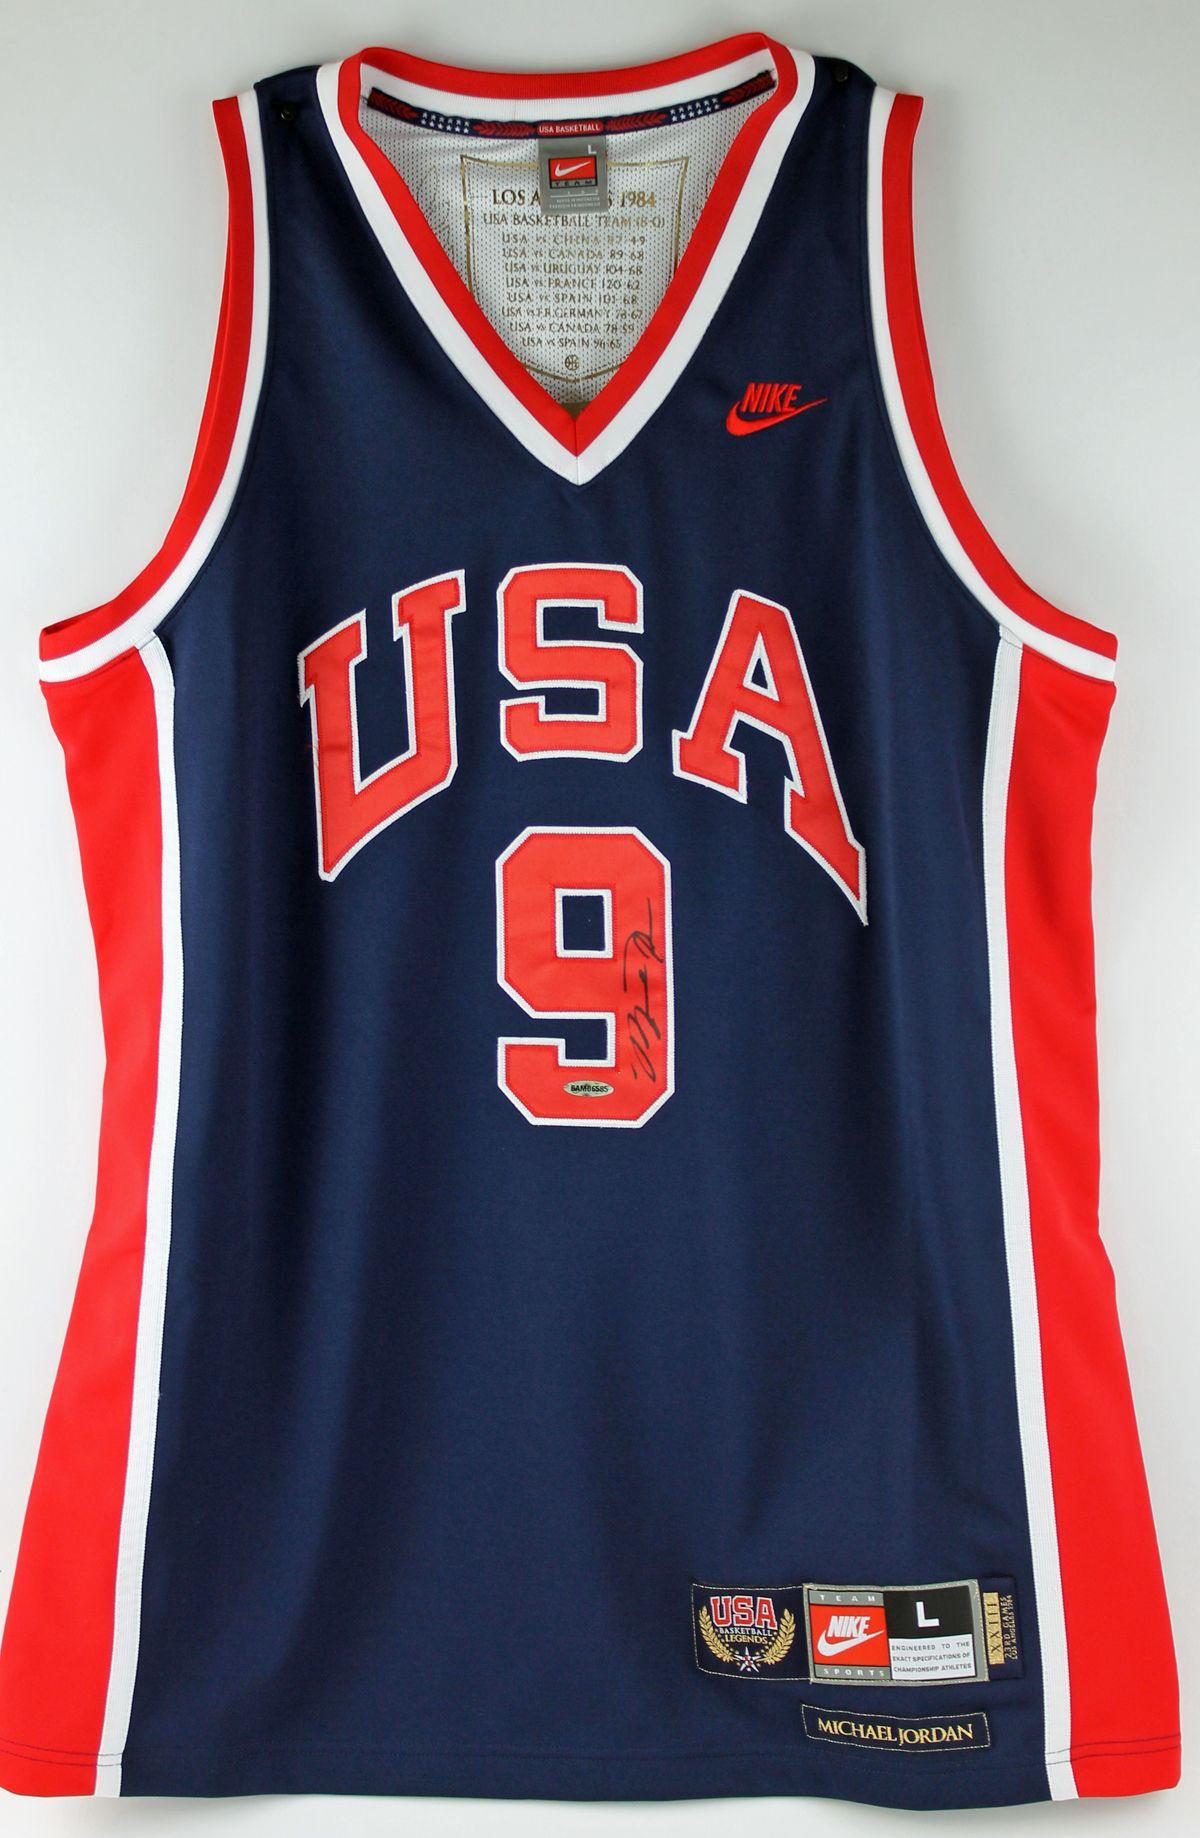 Fancy Michael Jordan Autographed USA Basketball Jersey